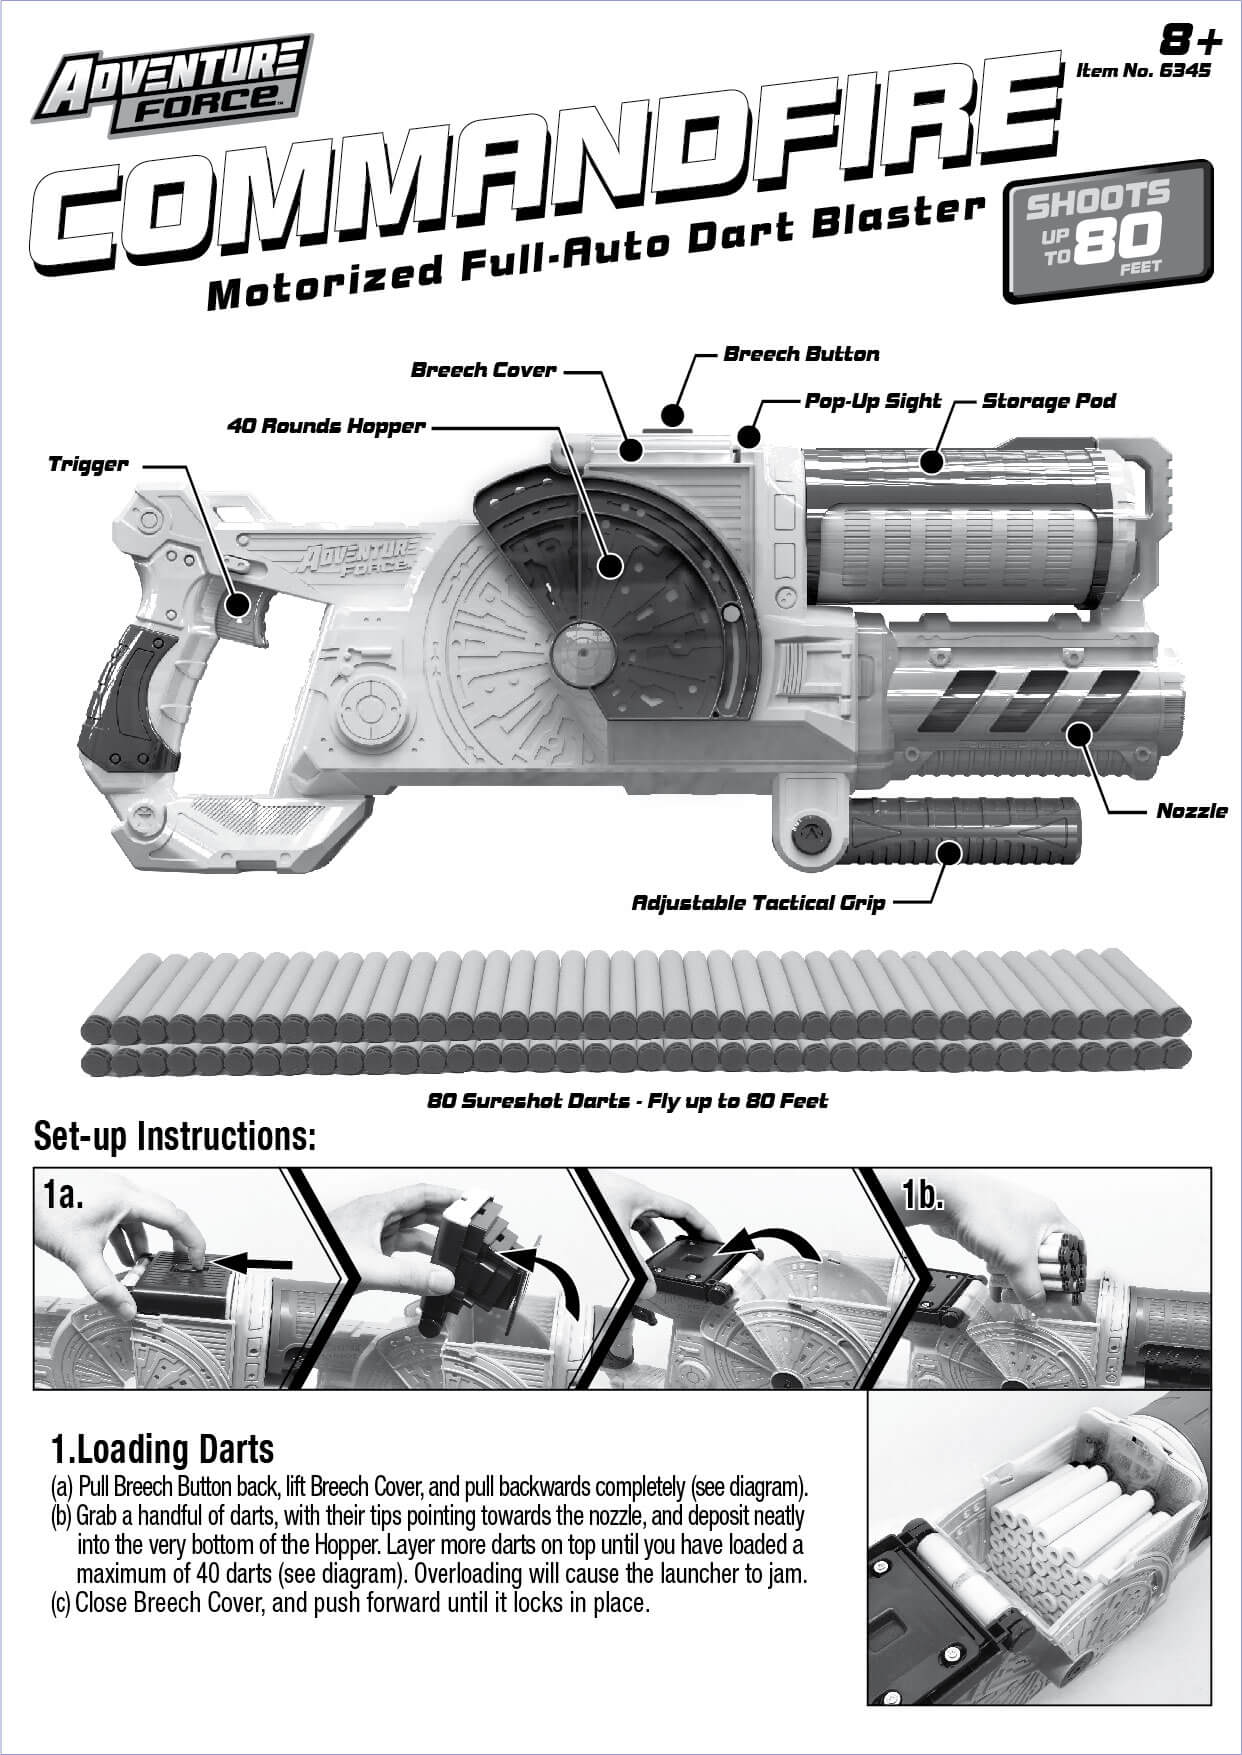 Adventure Force Commandfire Motorized Full-Auto Dart